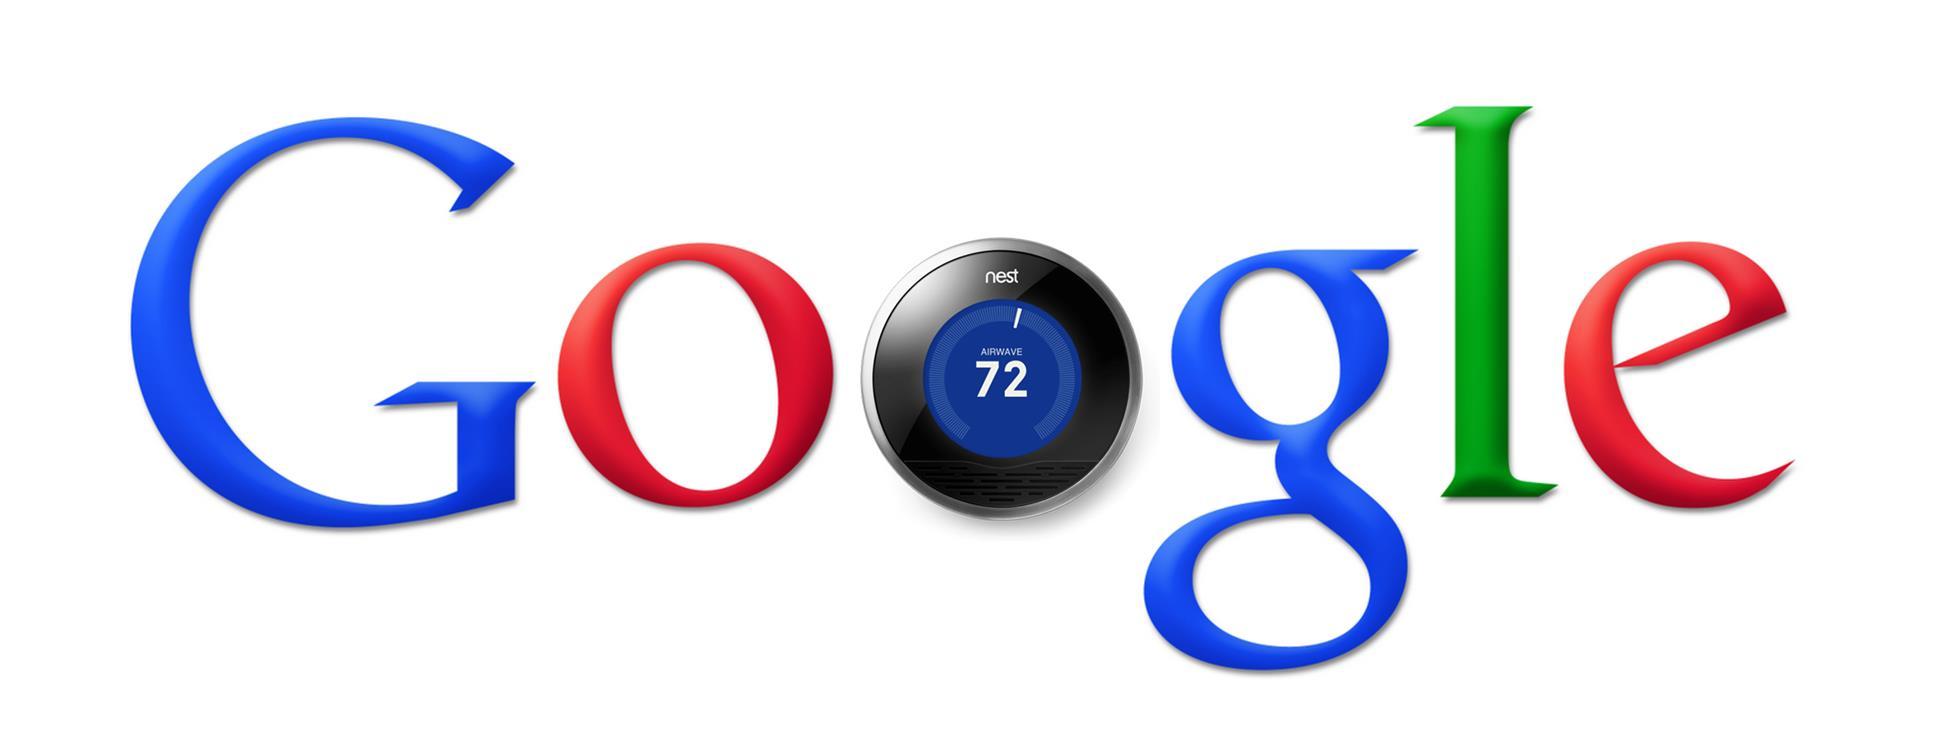 nest-google-revolv